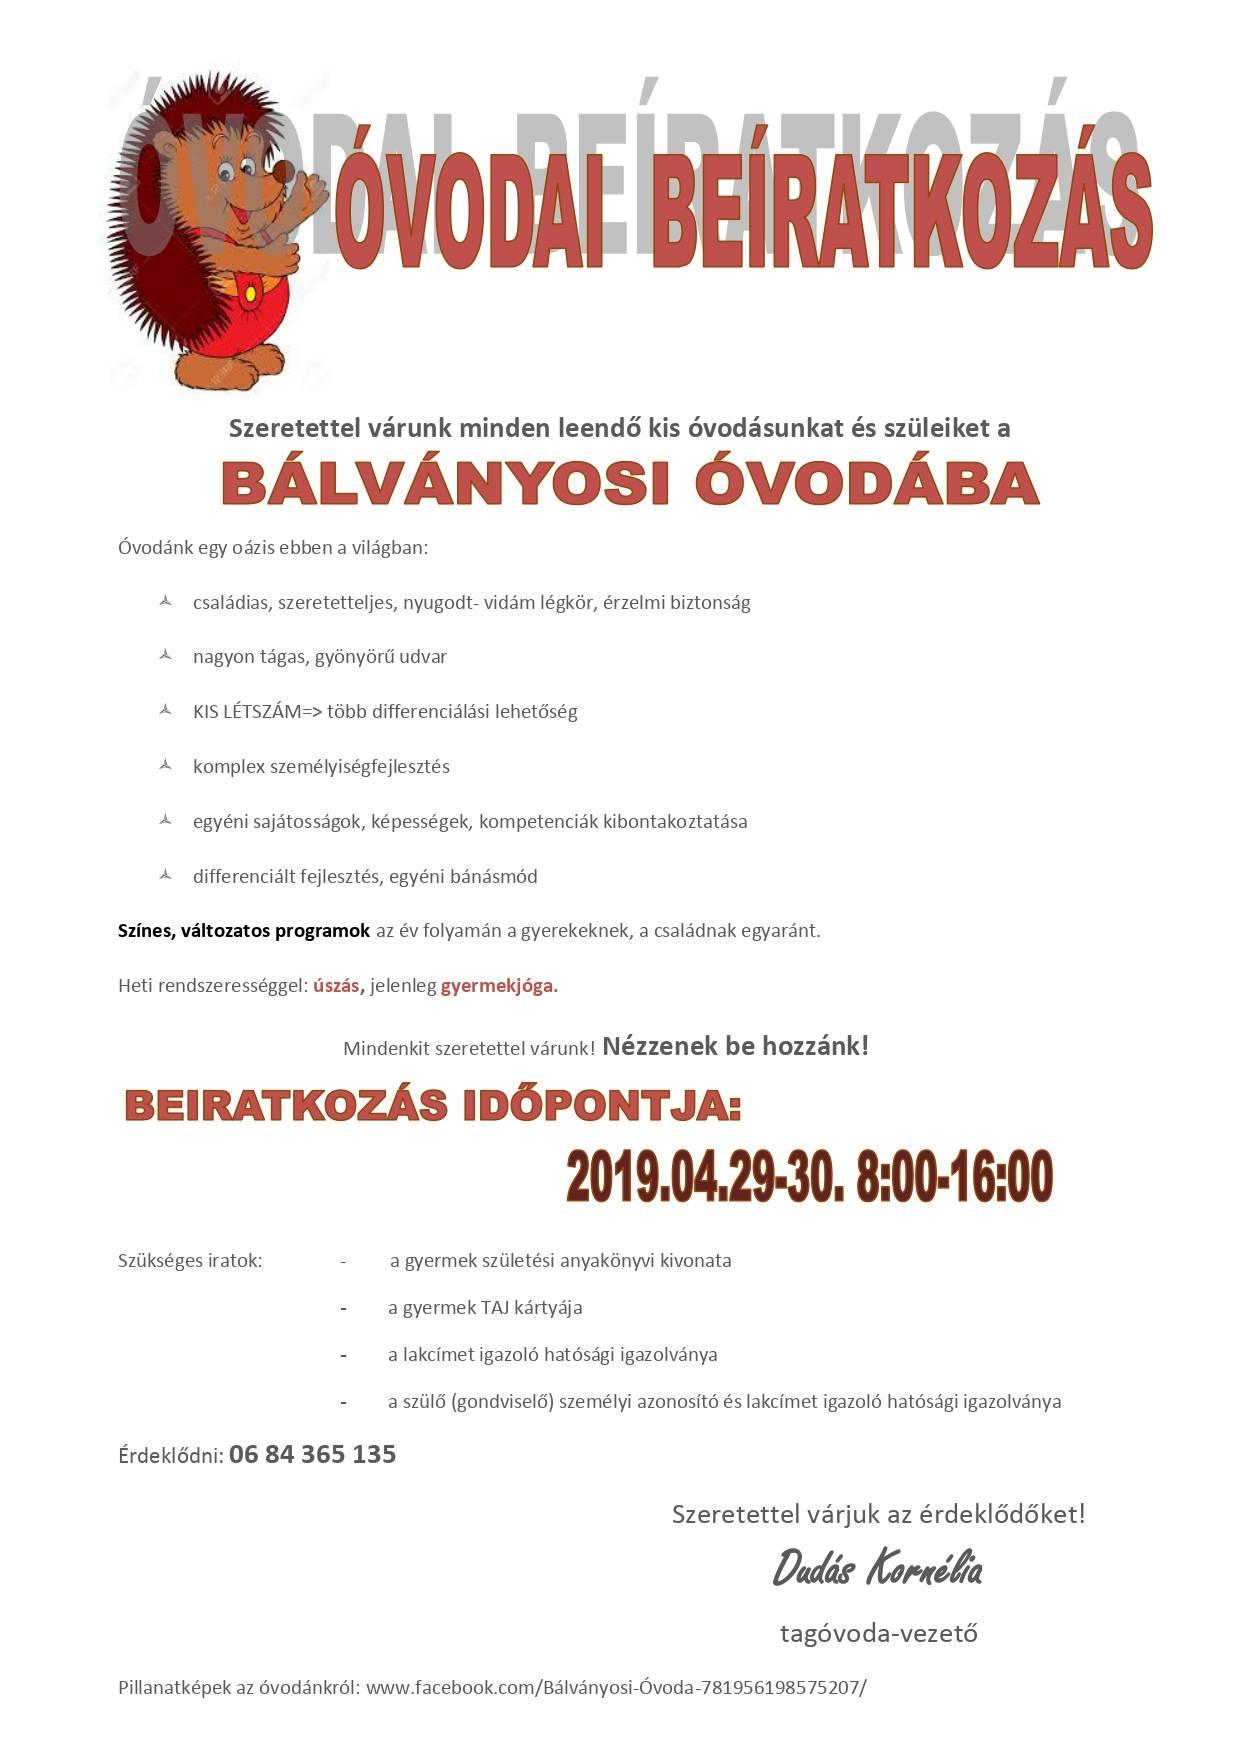 2019-ovoda-beiratkozas.jpg